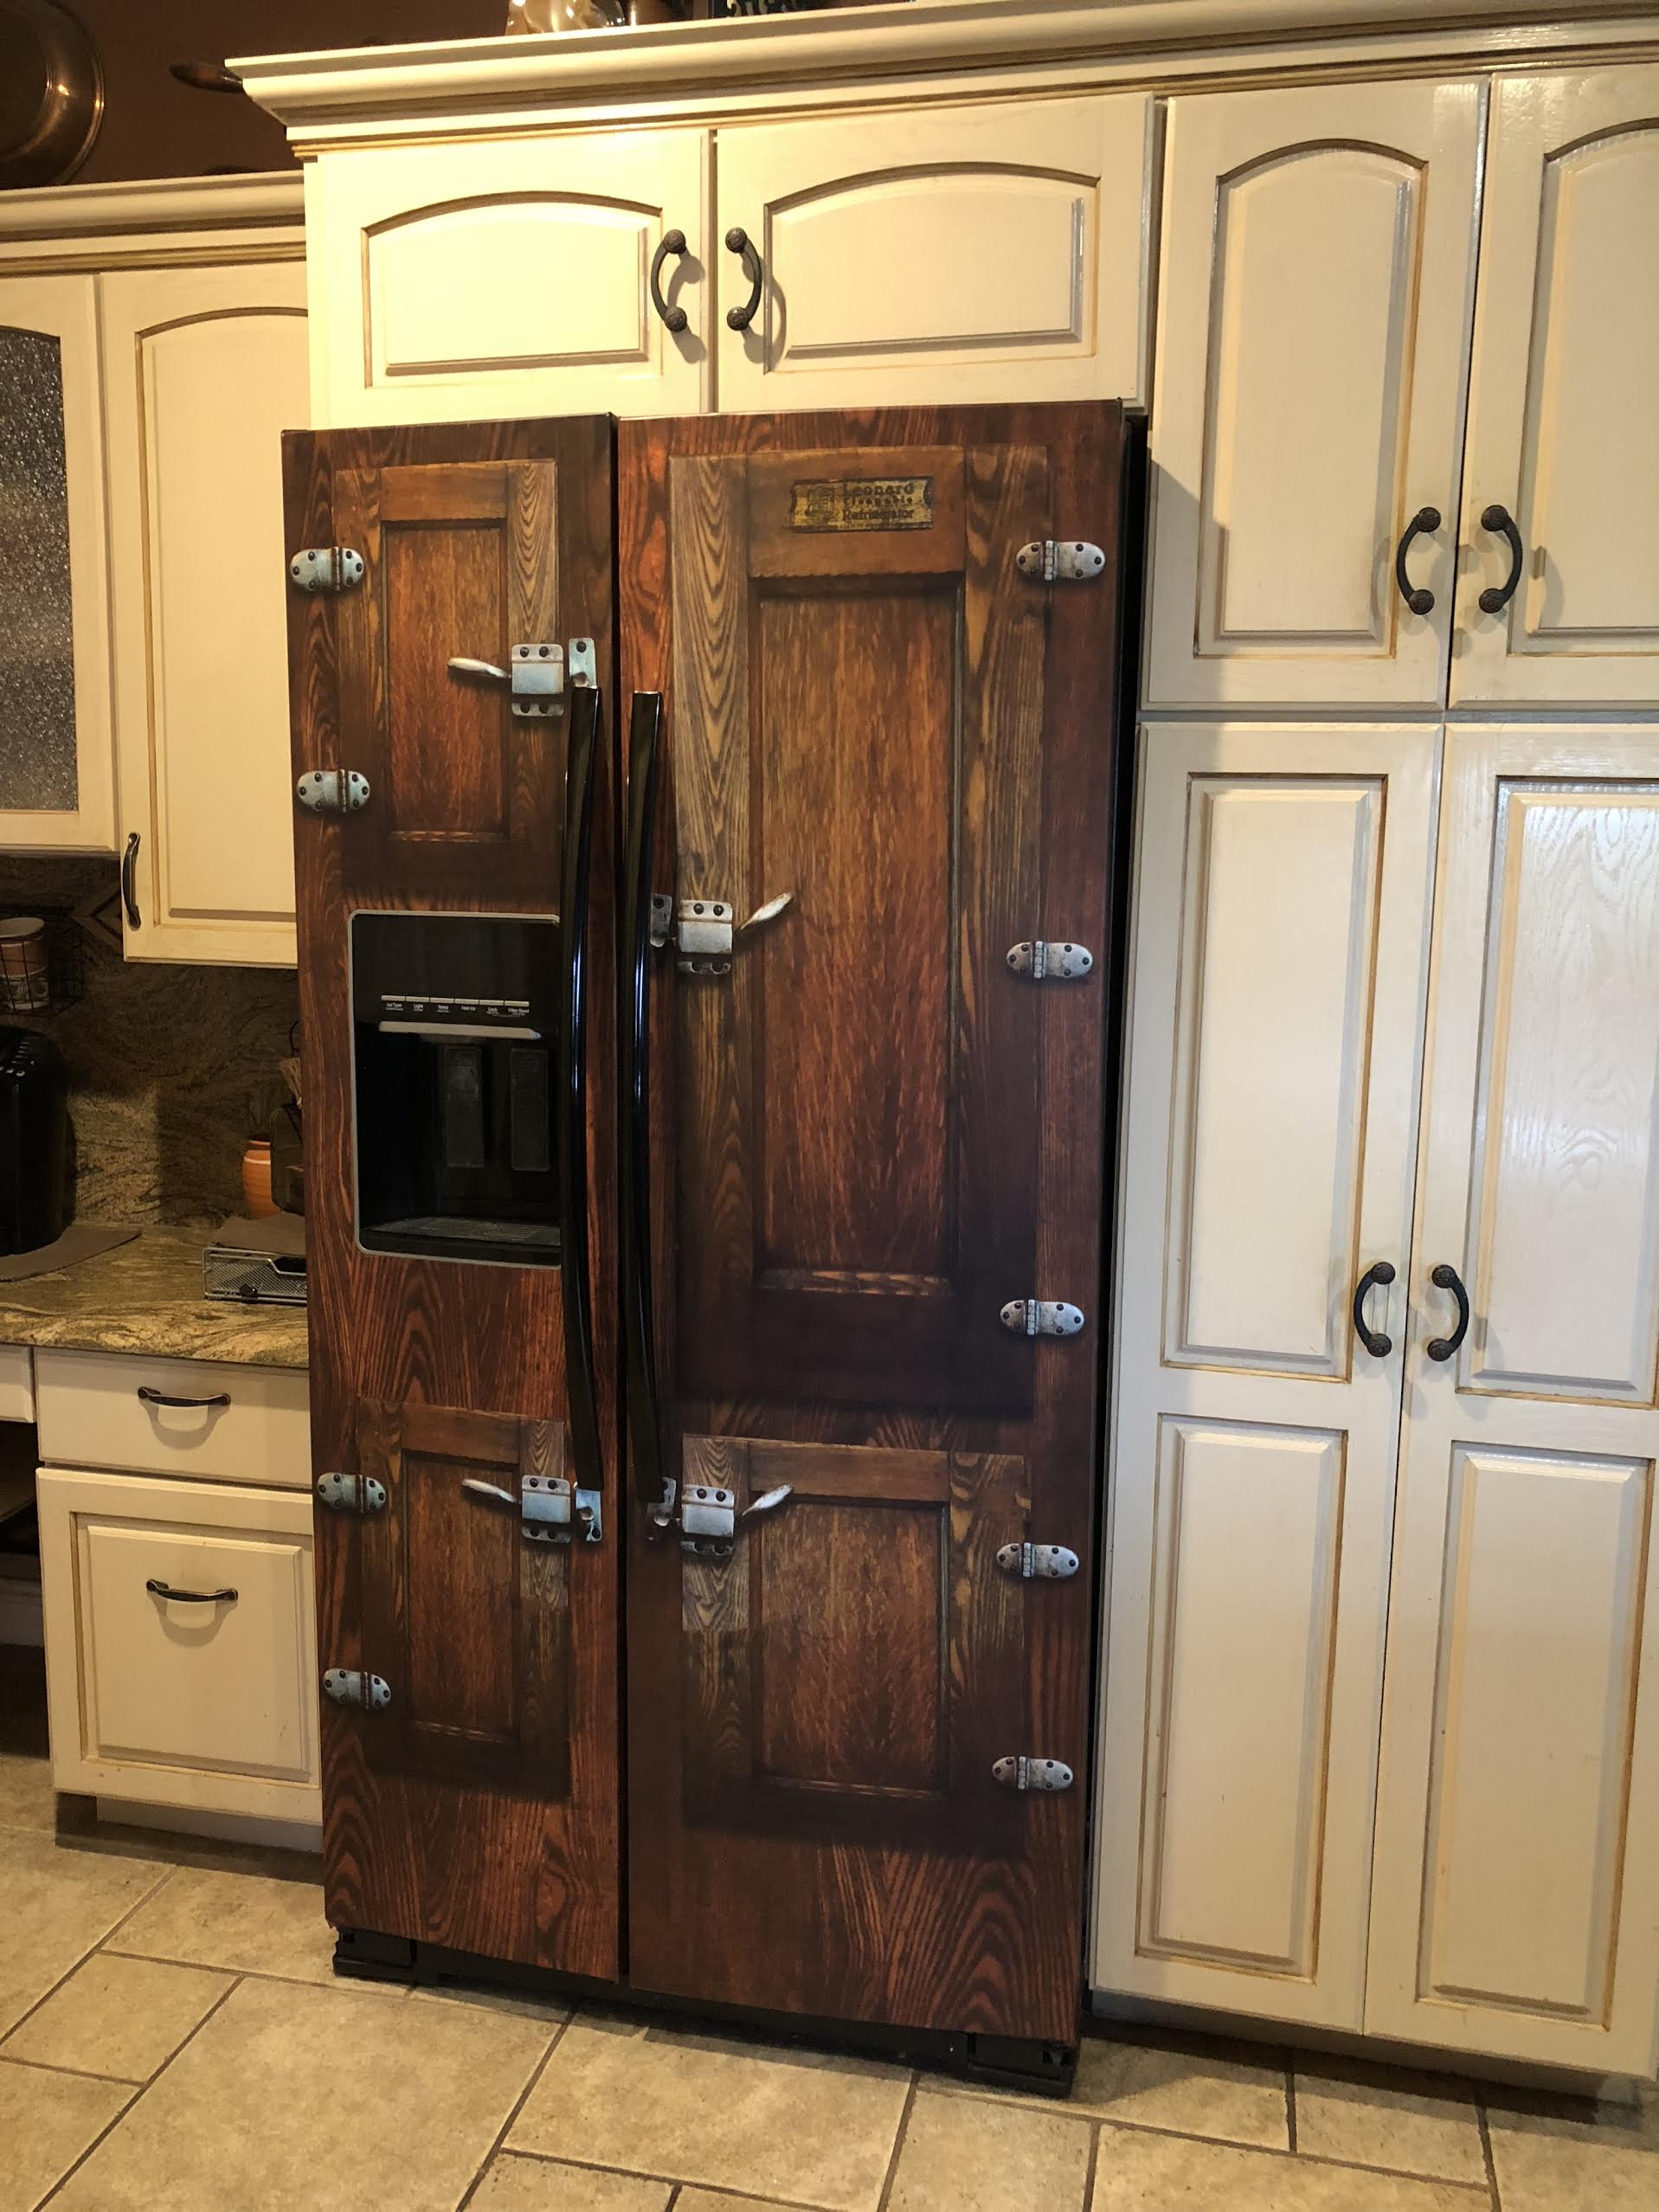 Icebox, Side by Side, Refrigerator Wrap, Vintage Icebox, Unique wrap, fridge cover, wooden fridge